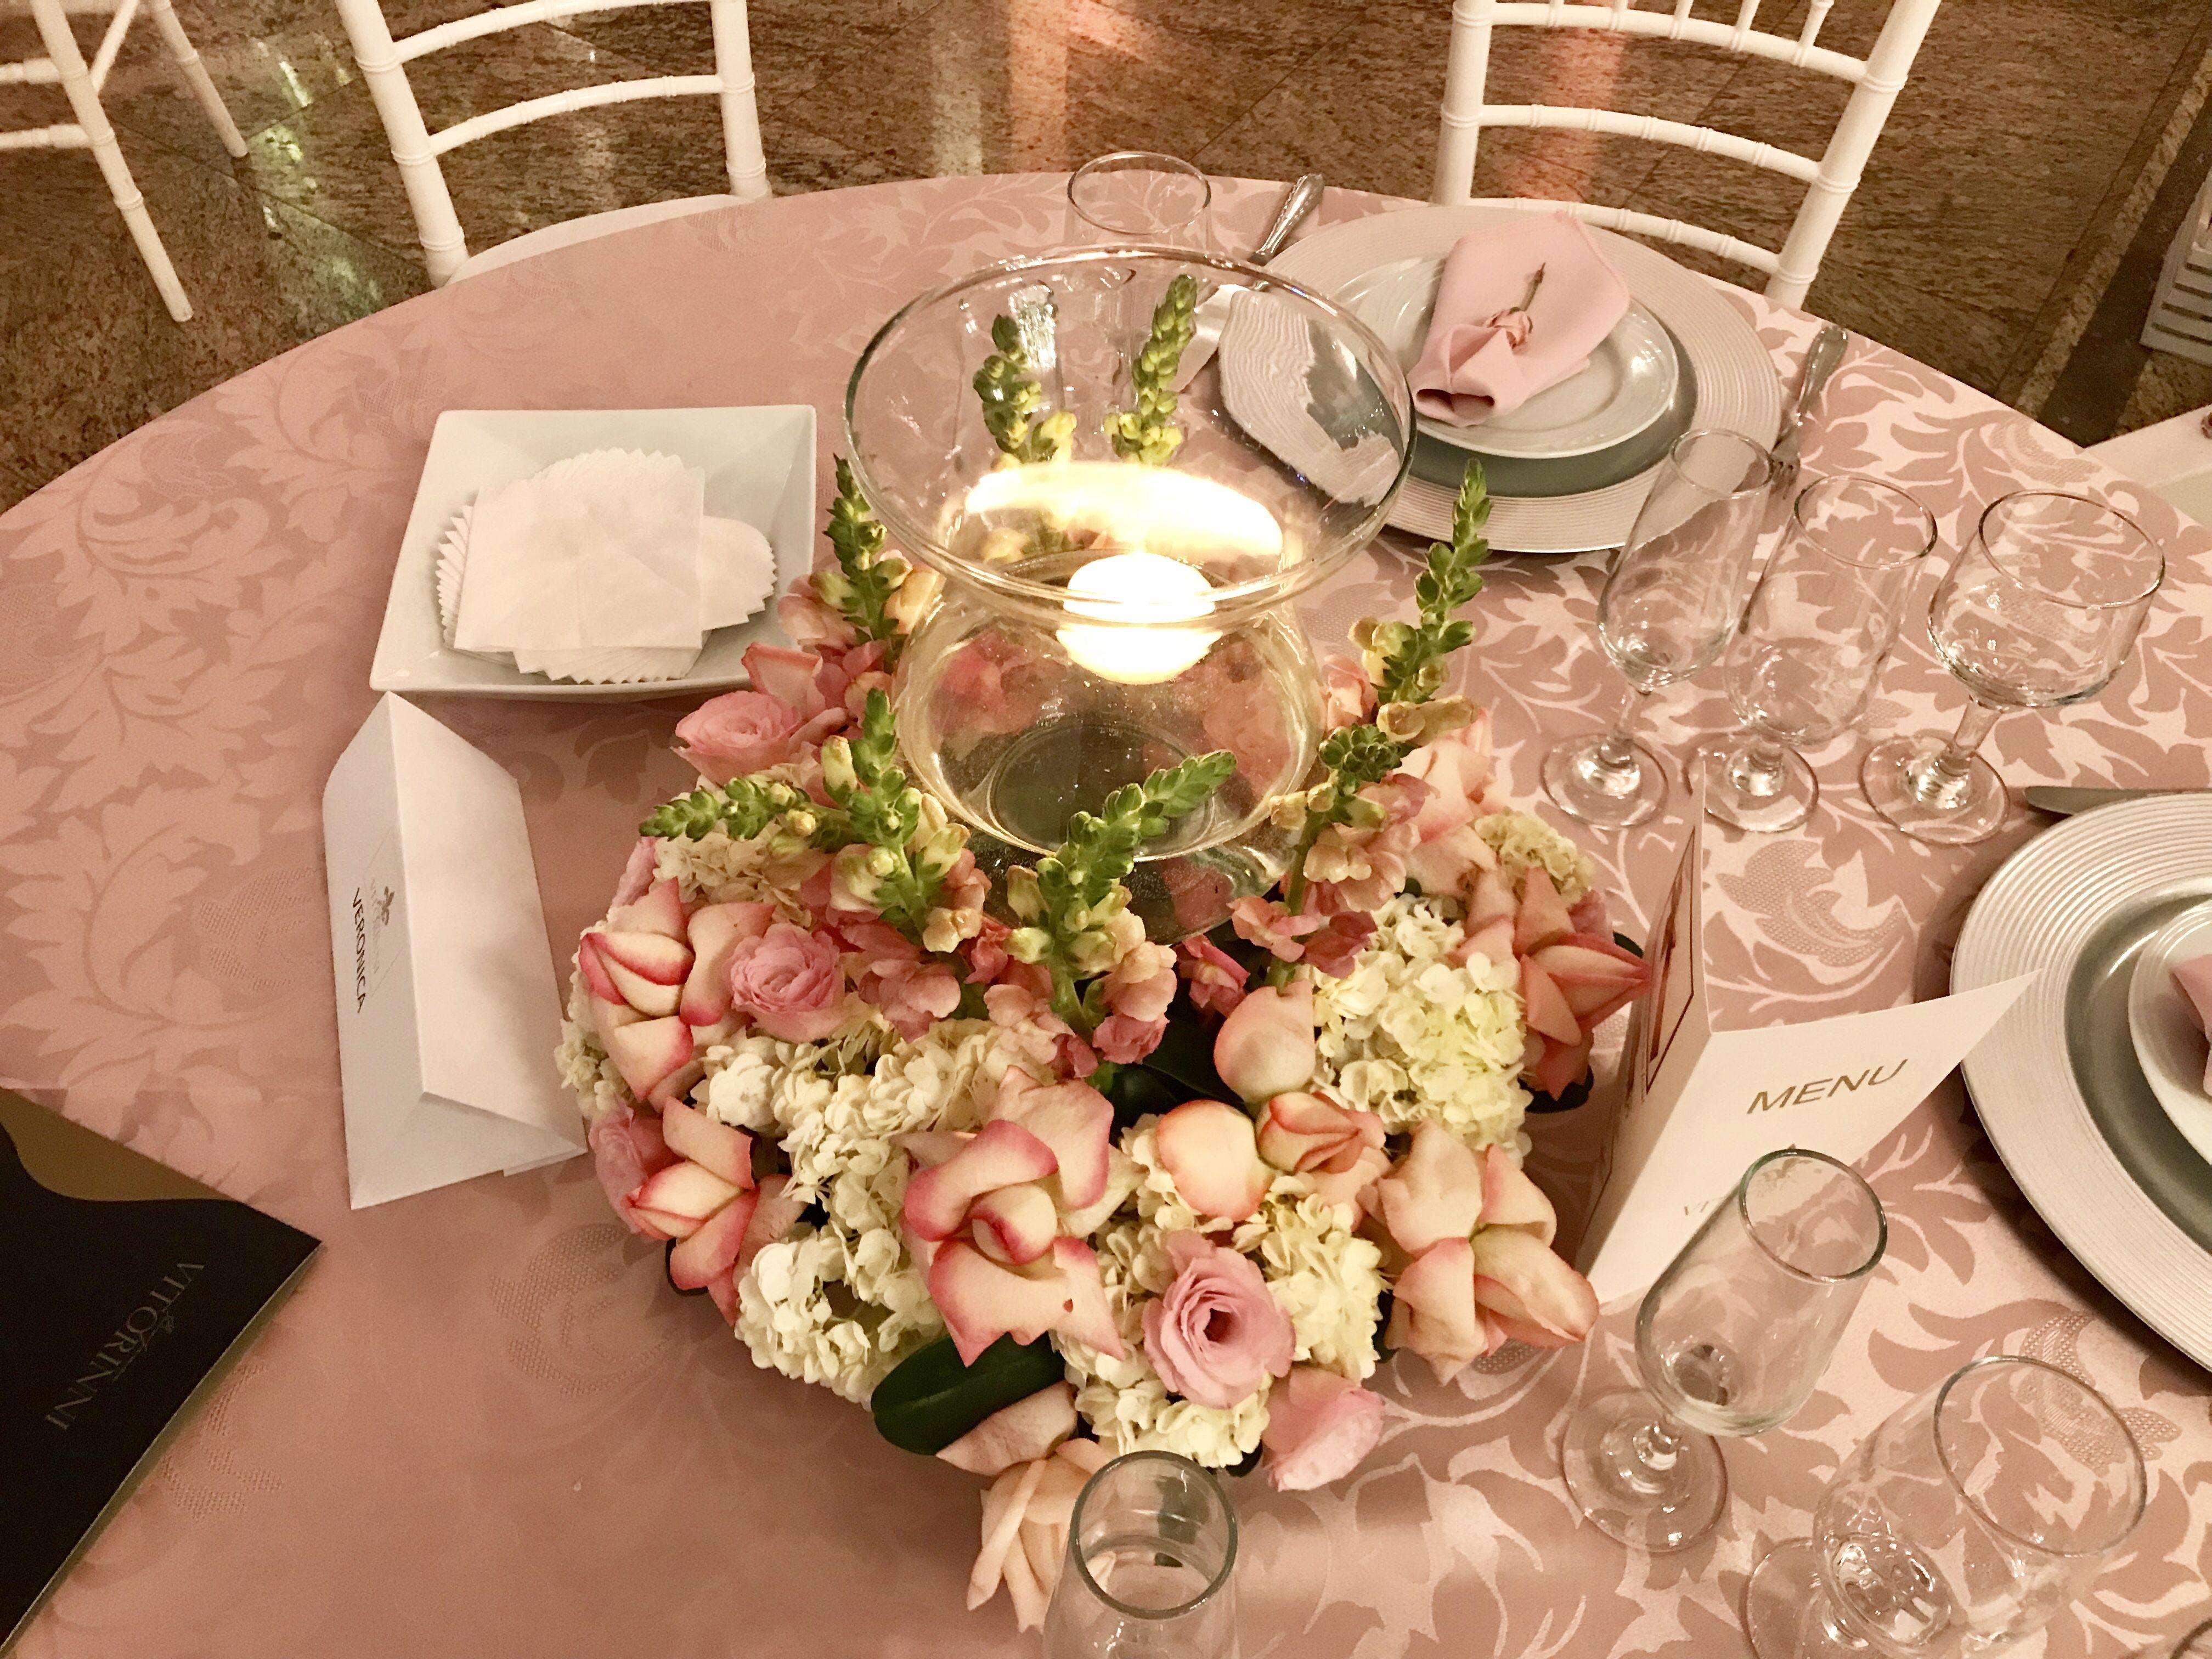 Arranjo Delicado Em Tons Rosa E Branco Mesa Convidados Casamento